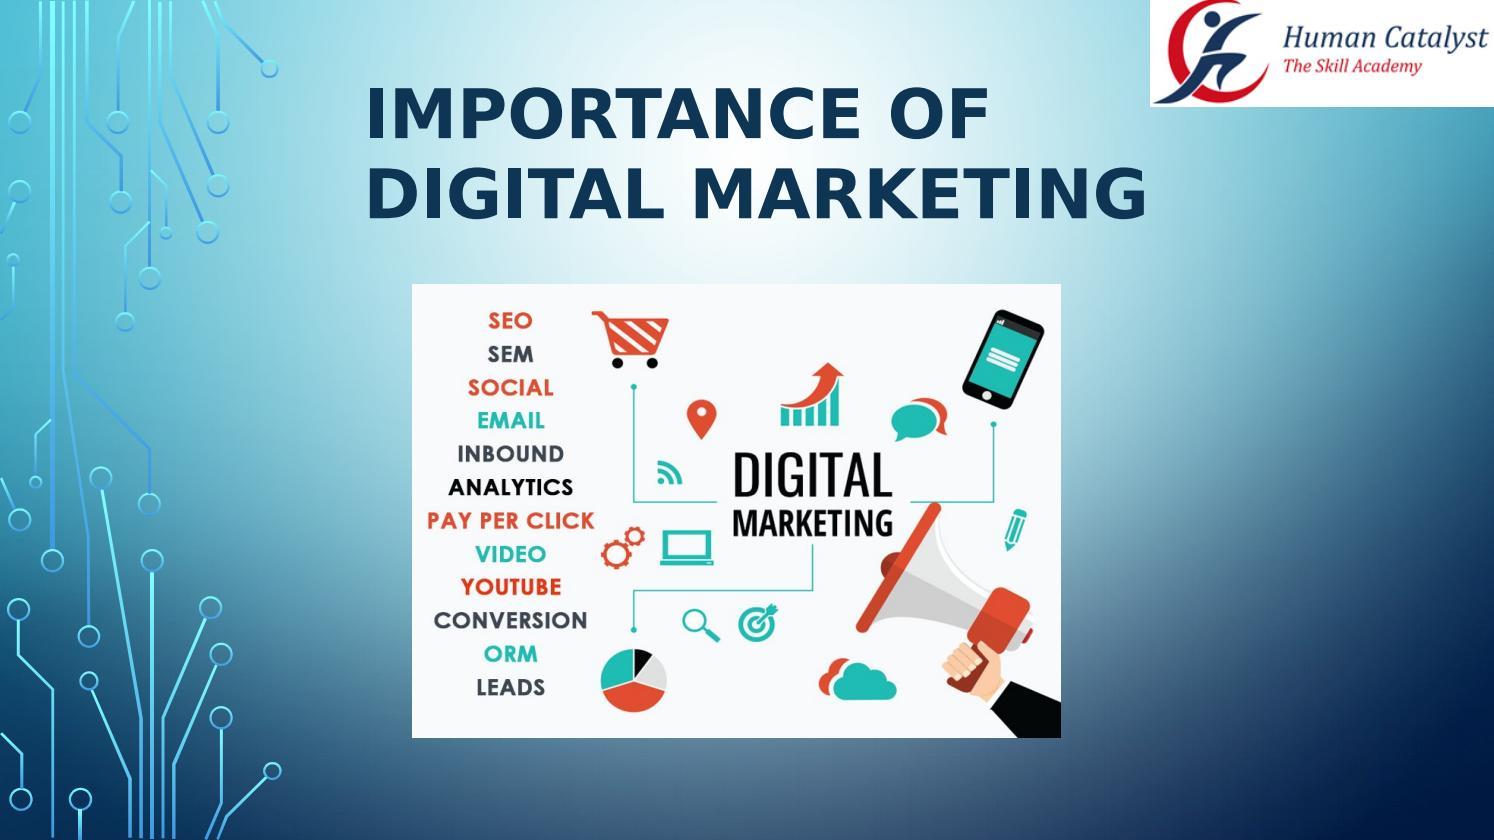 DIGITAL MARKETING PPT| importance of digital marketing by